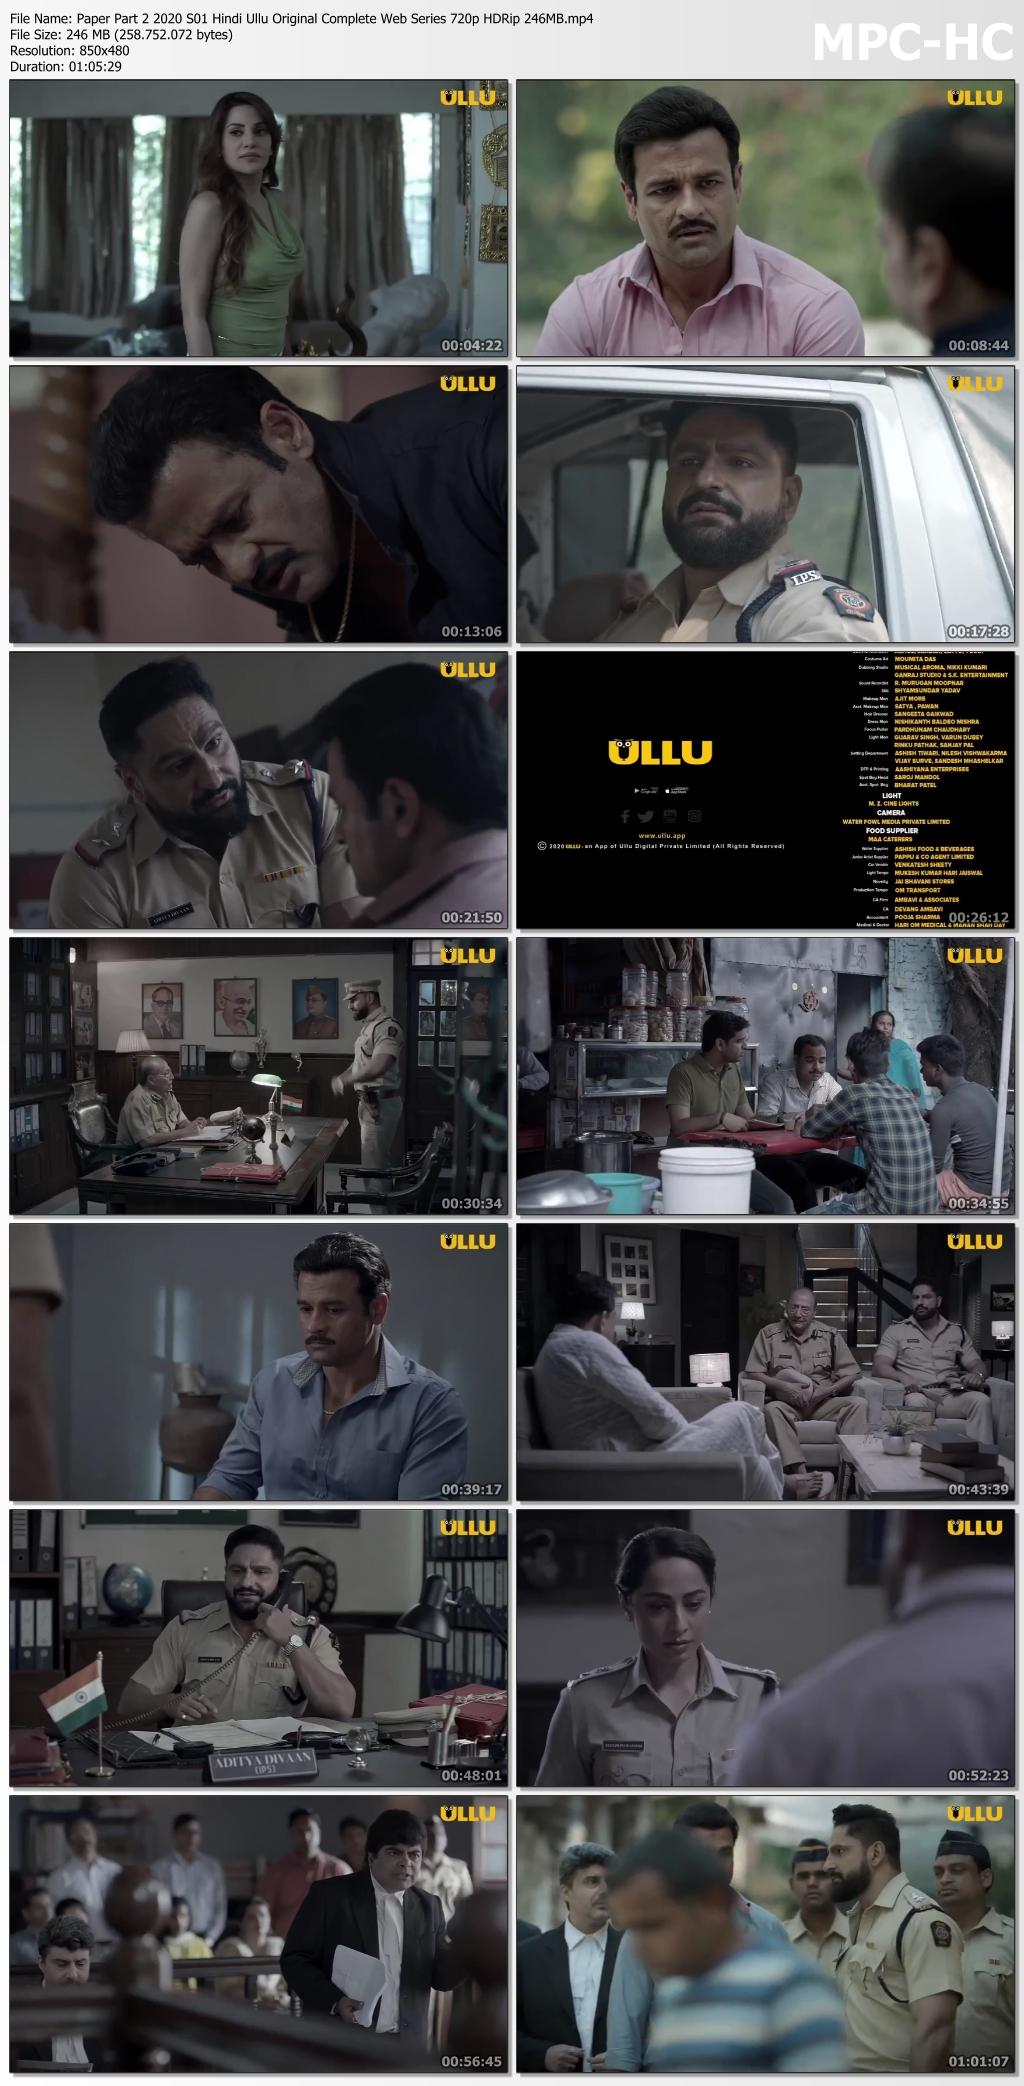 Paper-Part-2-2020-S01-Hindi-Ullu-Original-Complete-Web-Series-720p-HDRip-246-MB-mp4-thumbs